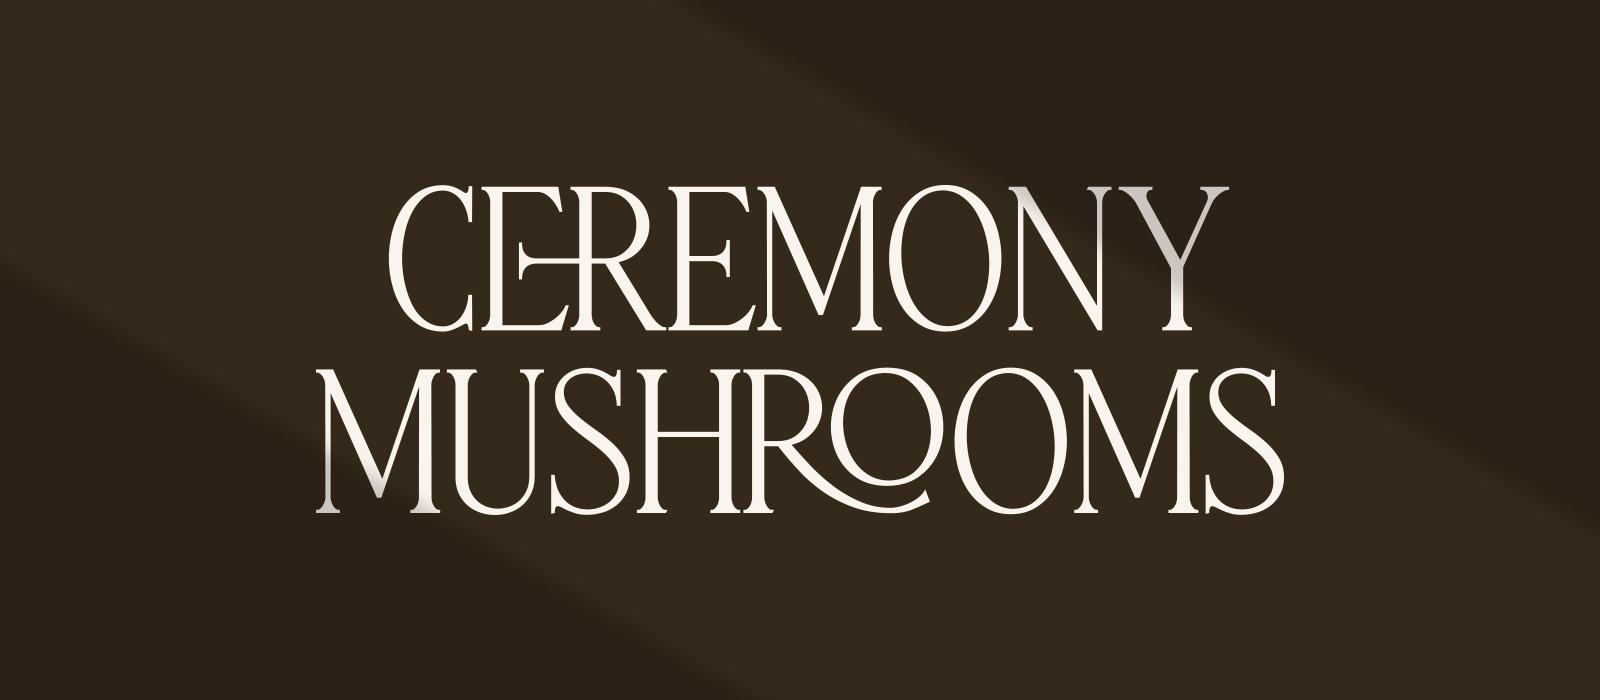 Ceremony Mushrooms